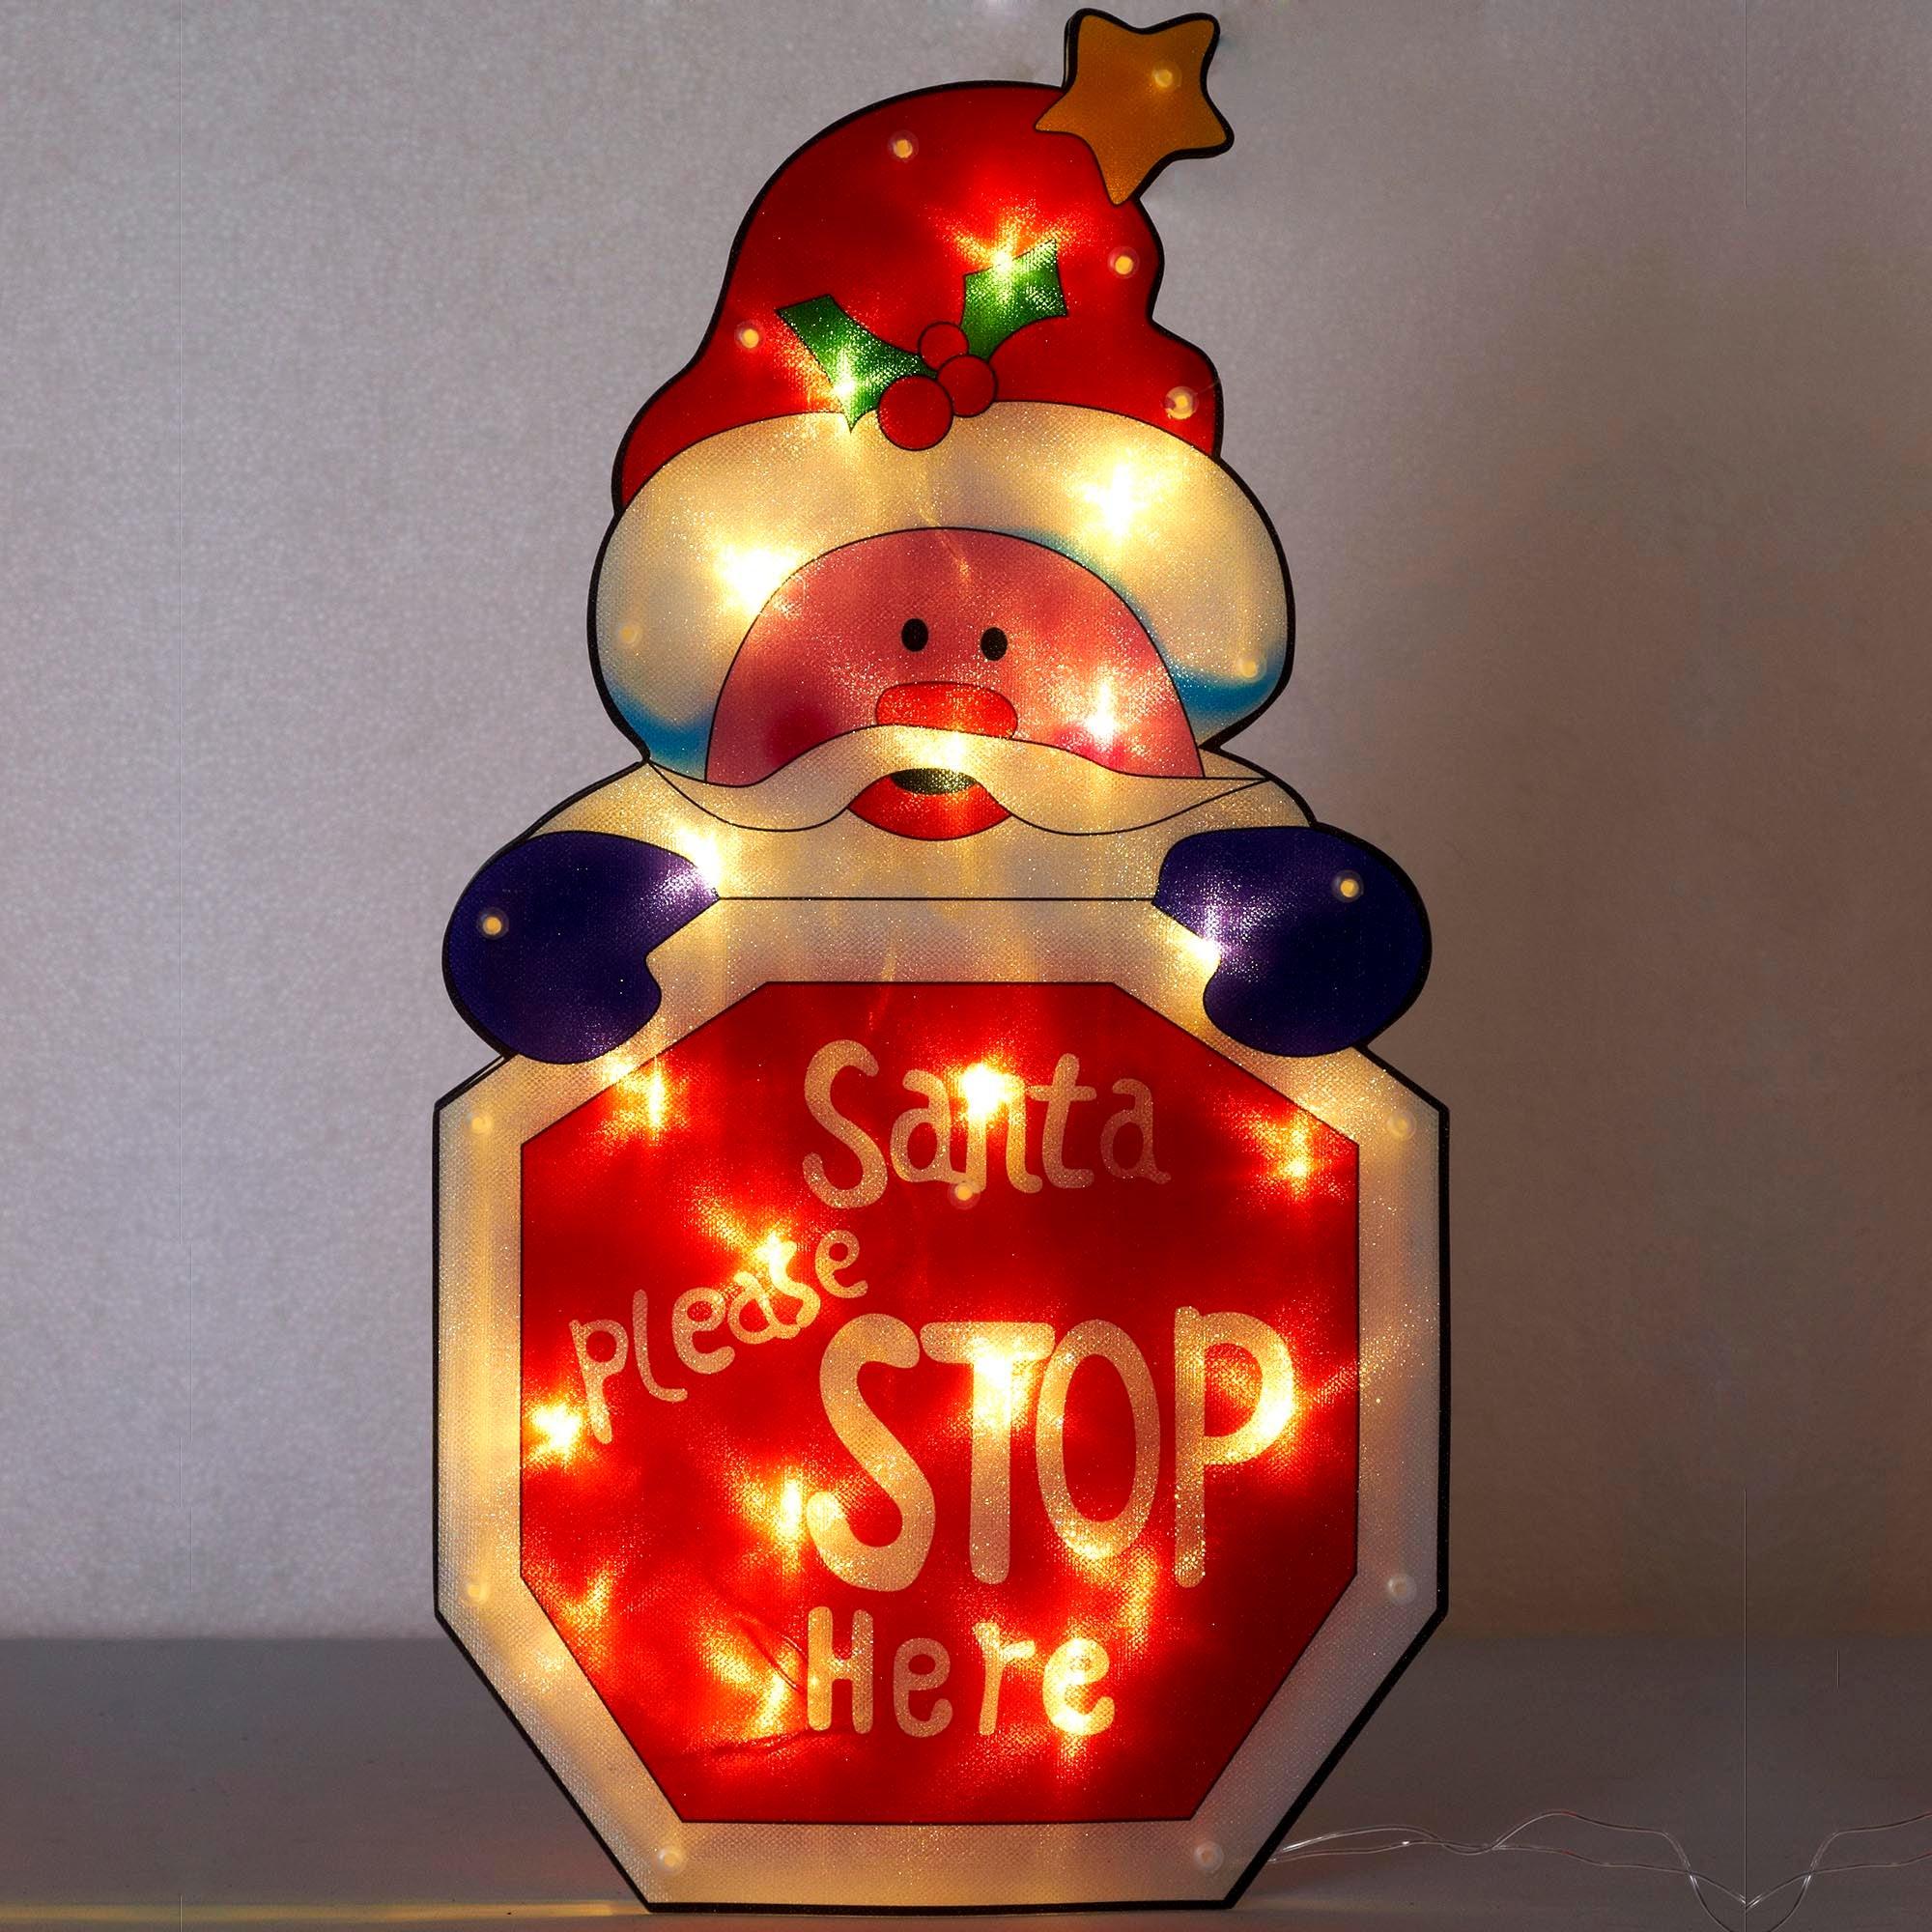 Santa Stop Here LED Illuminated Sign